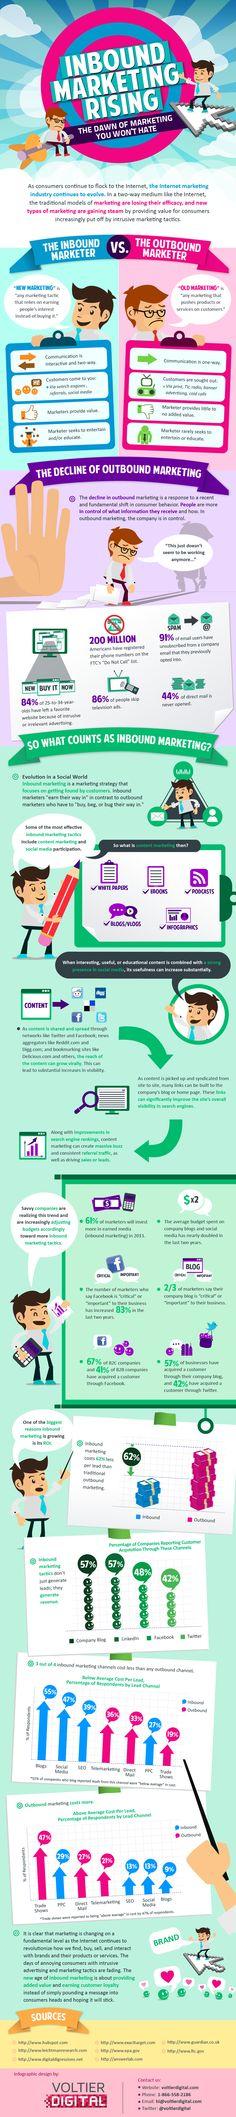 Inbound Marketing vs. Outbound Marketing #Marketing How to find your way throughout internet marketing ?